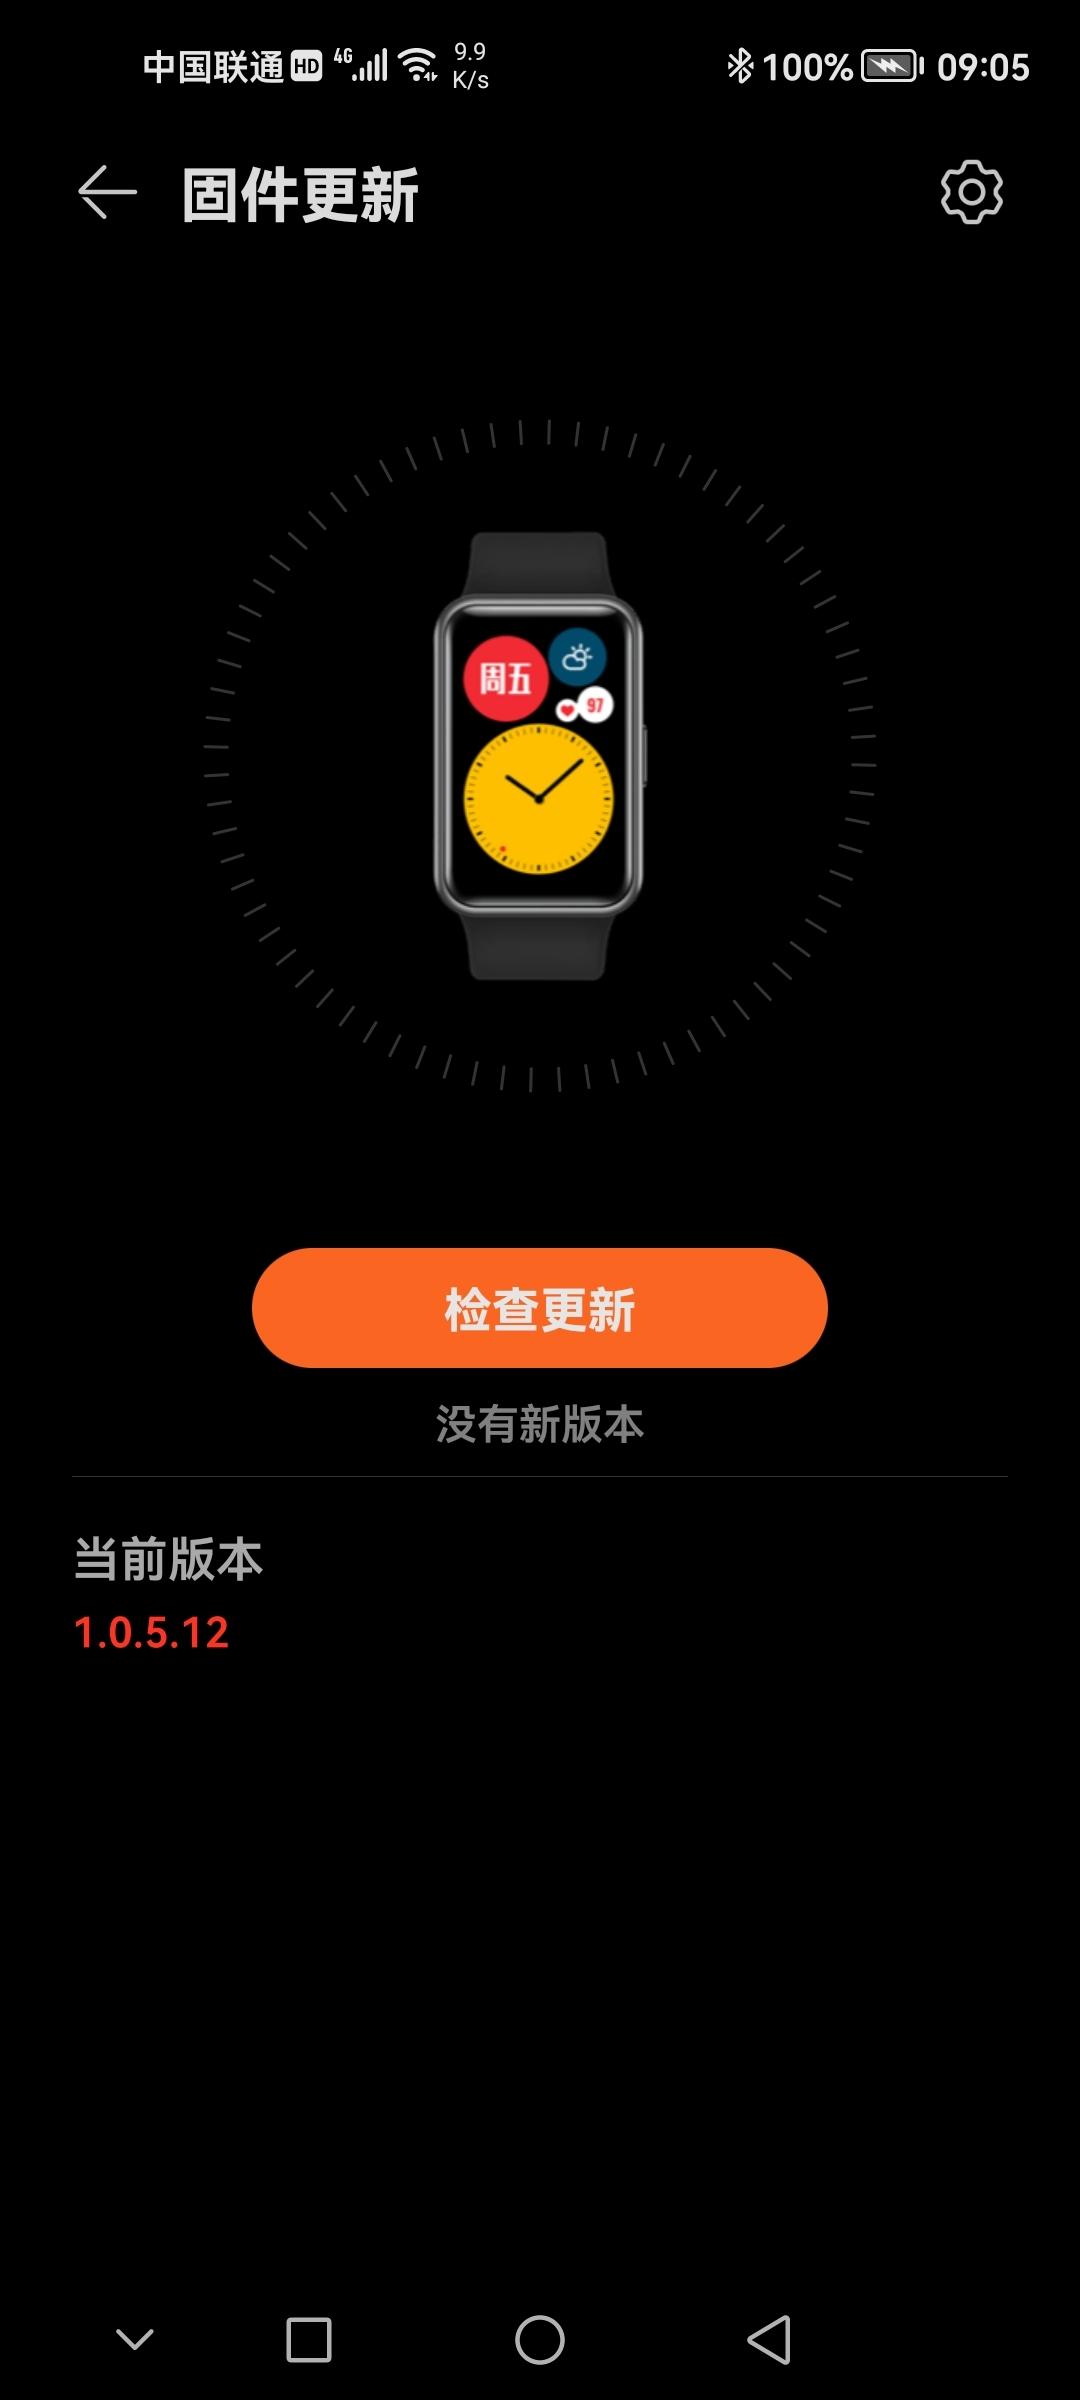 Screenshot_20210704_090517_com.huawei.health.jpg